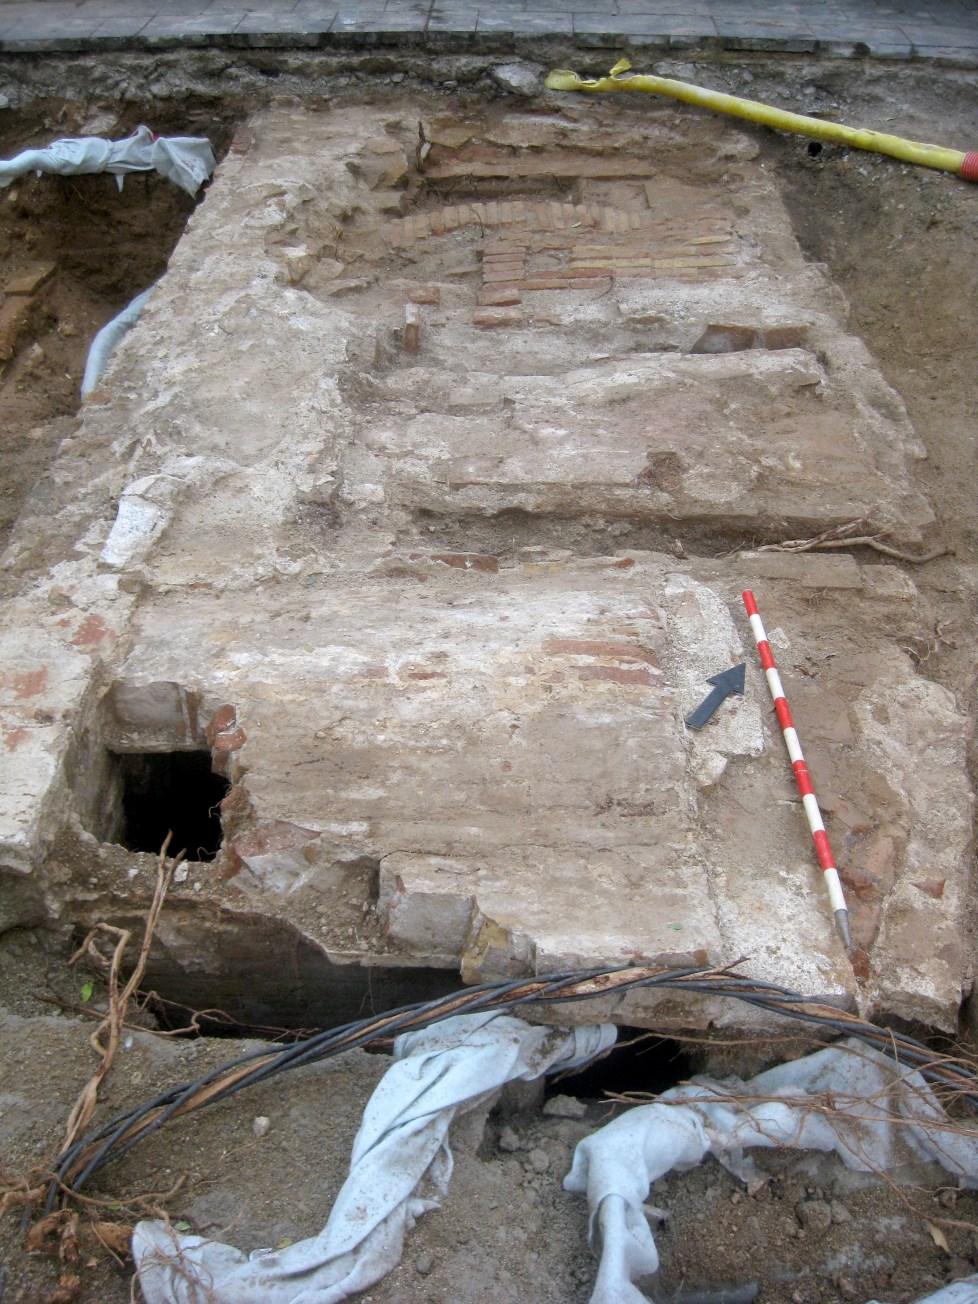 Mur, dipòsits i clavegueres corresponents a l'església de Sant Agustí (s. XVIII). Foto: Esteve Nadal